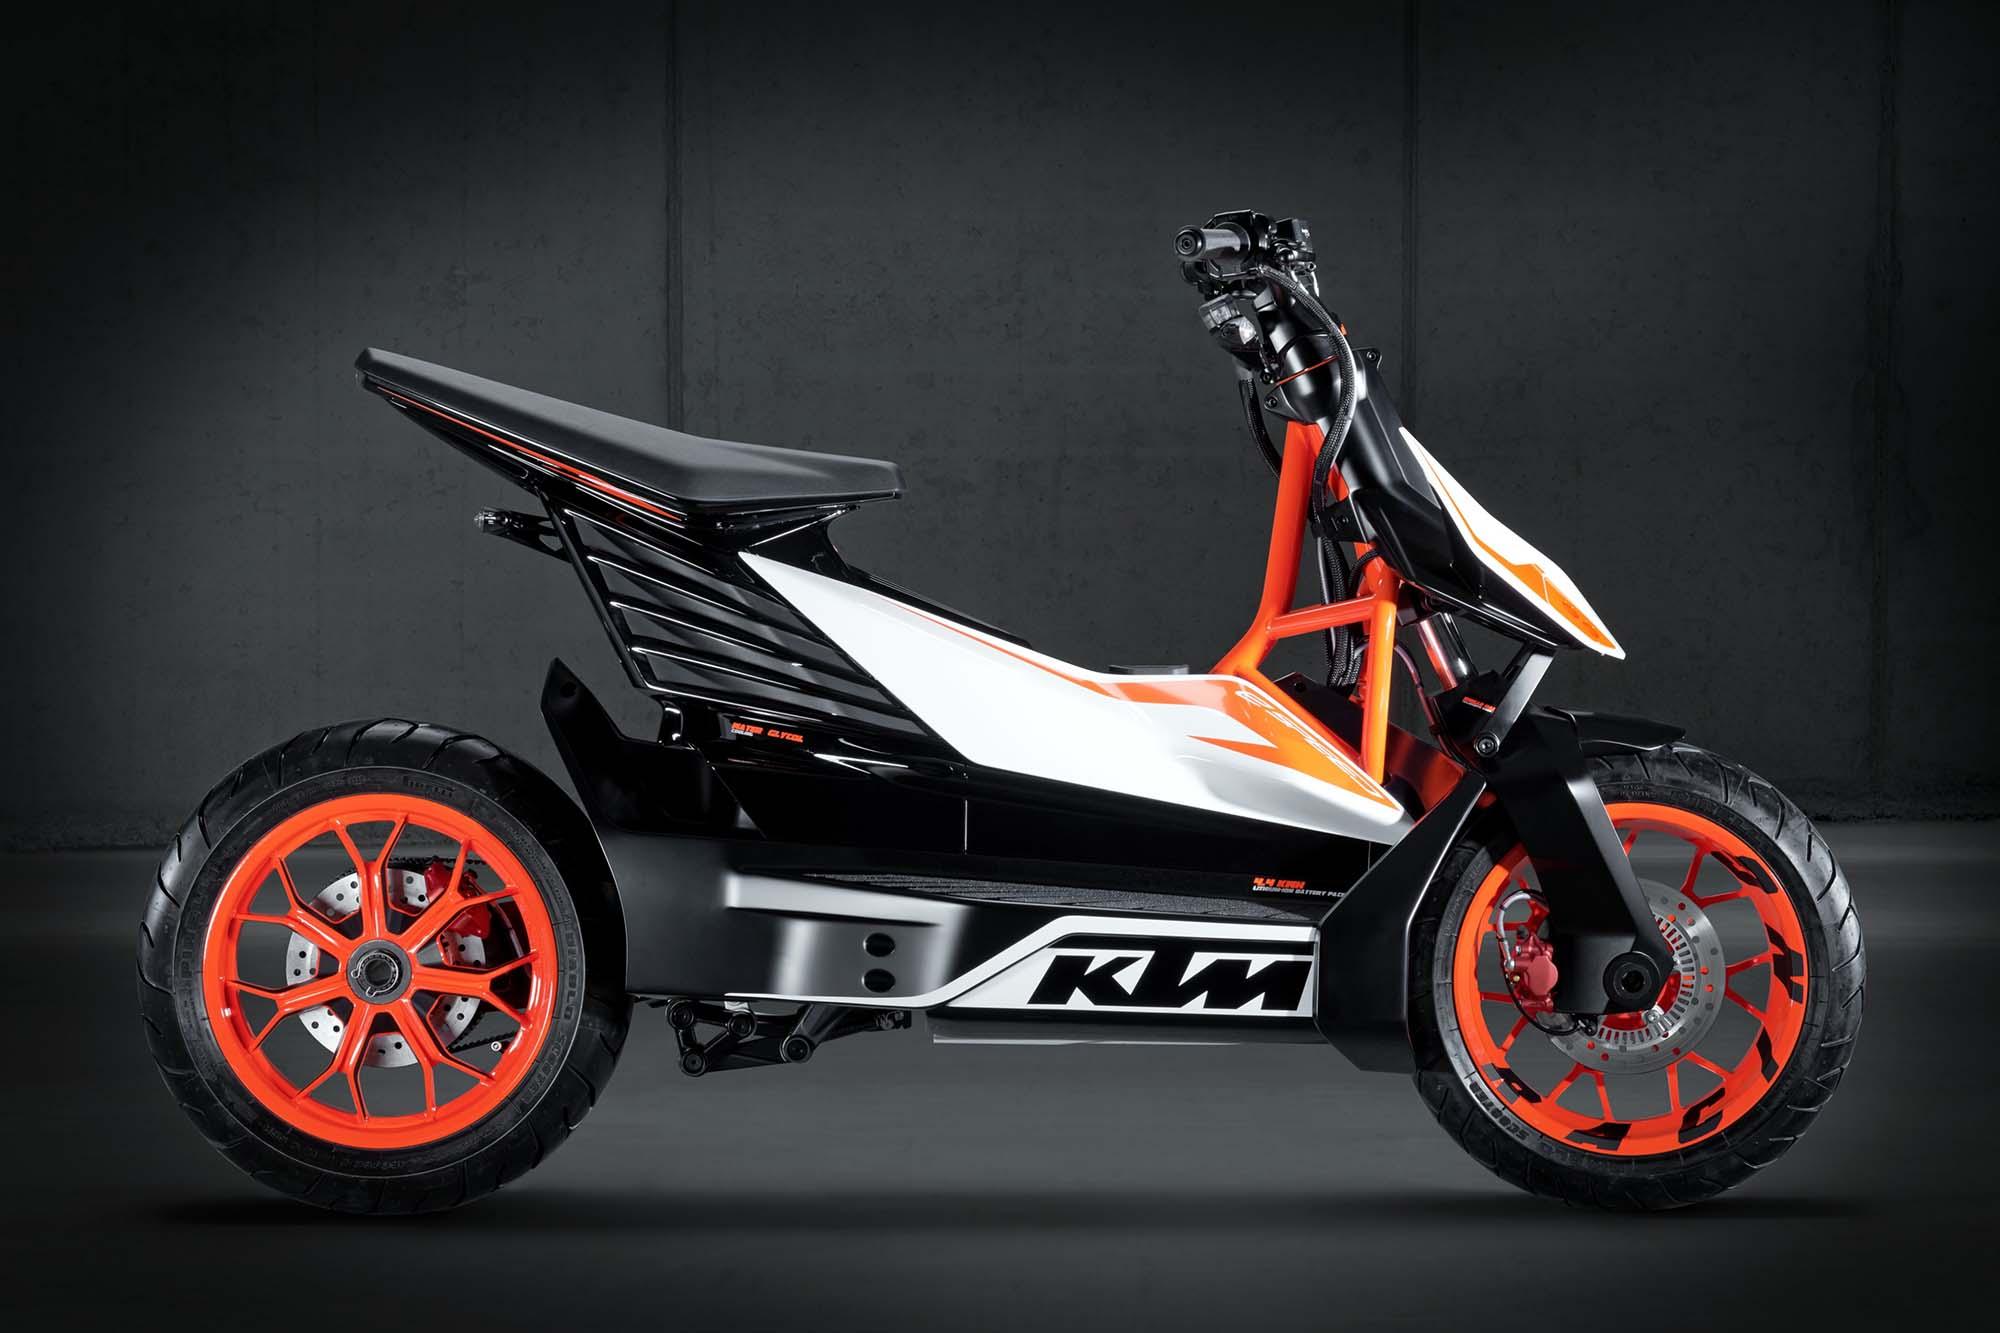 Ktm Freeride E Sm >> KTM Freeride E-SM (2015 - present) - Supermoto - Motorcycles - Visordown